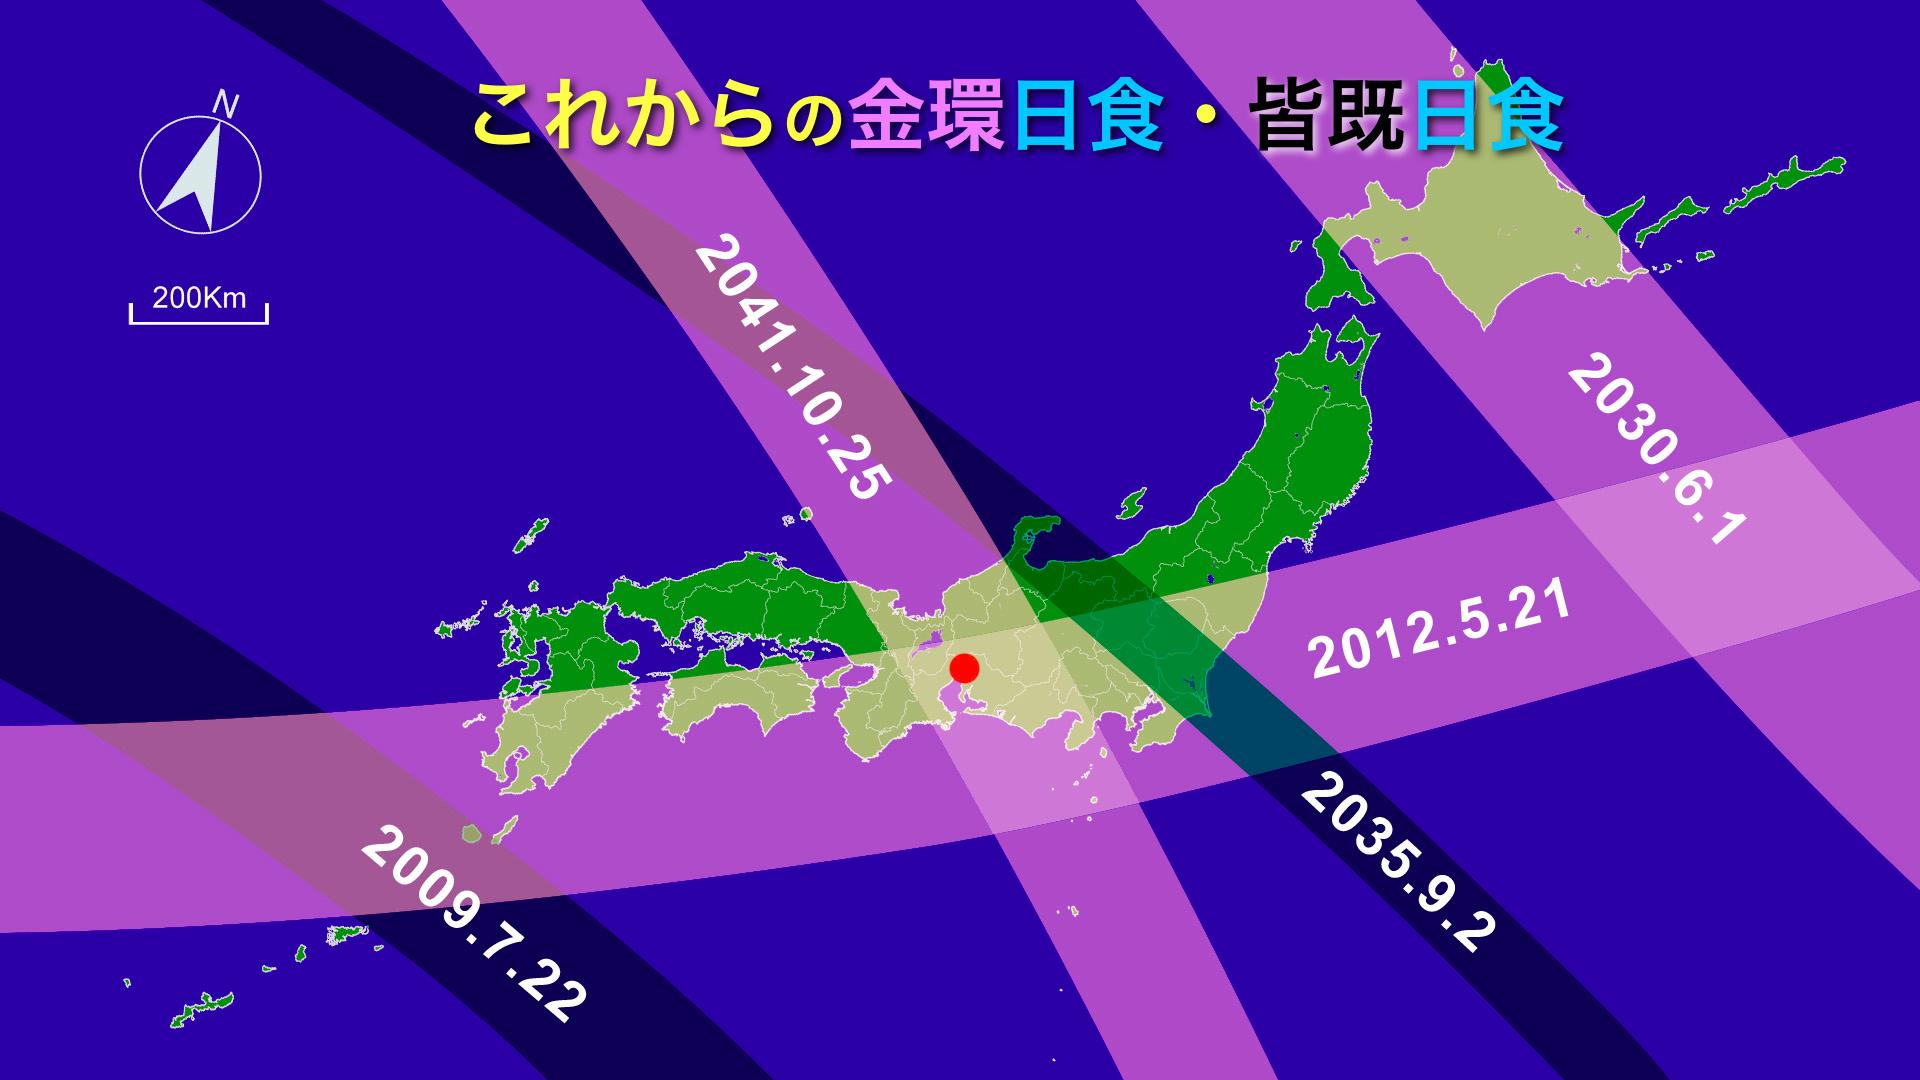 http://www.ncsm.city.nagoya.jp/study/astro/M_12-04IP.076.jpg